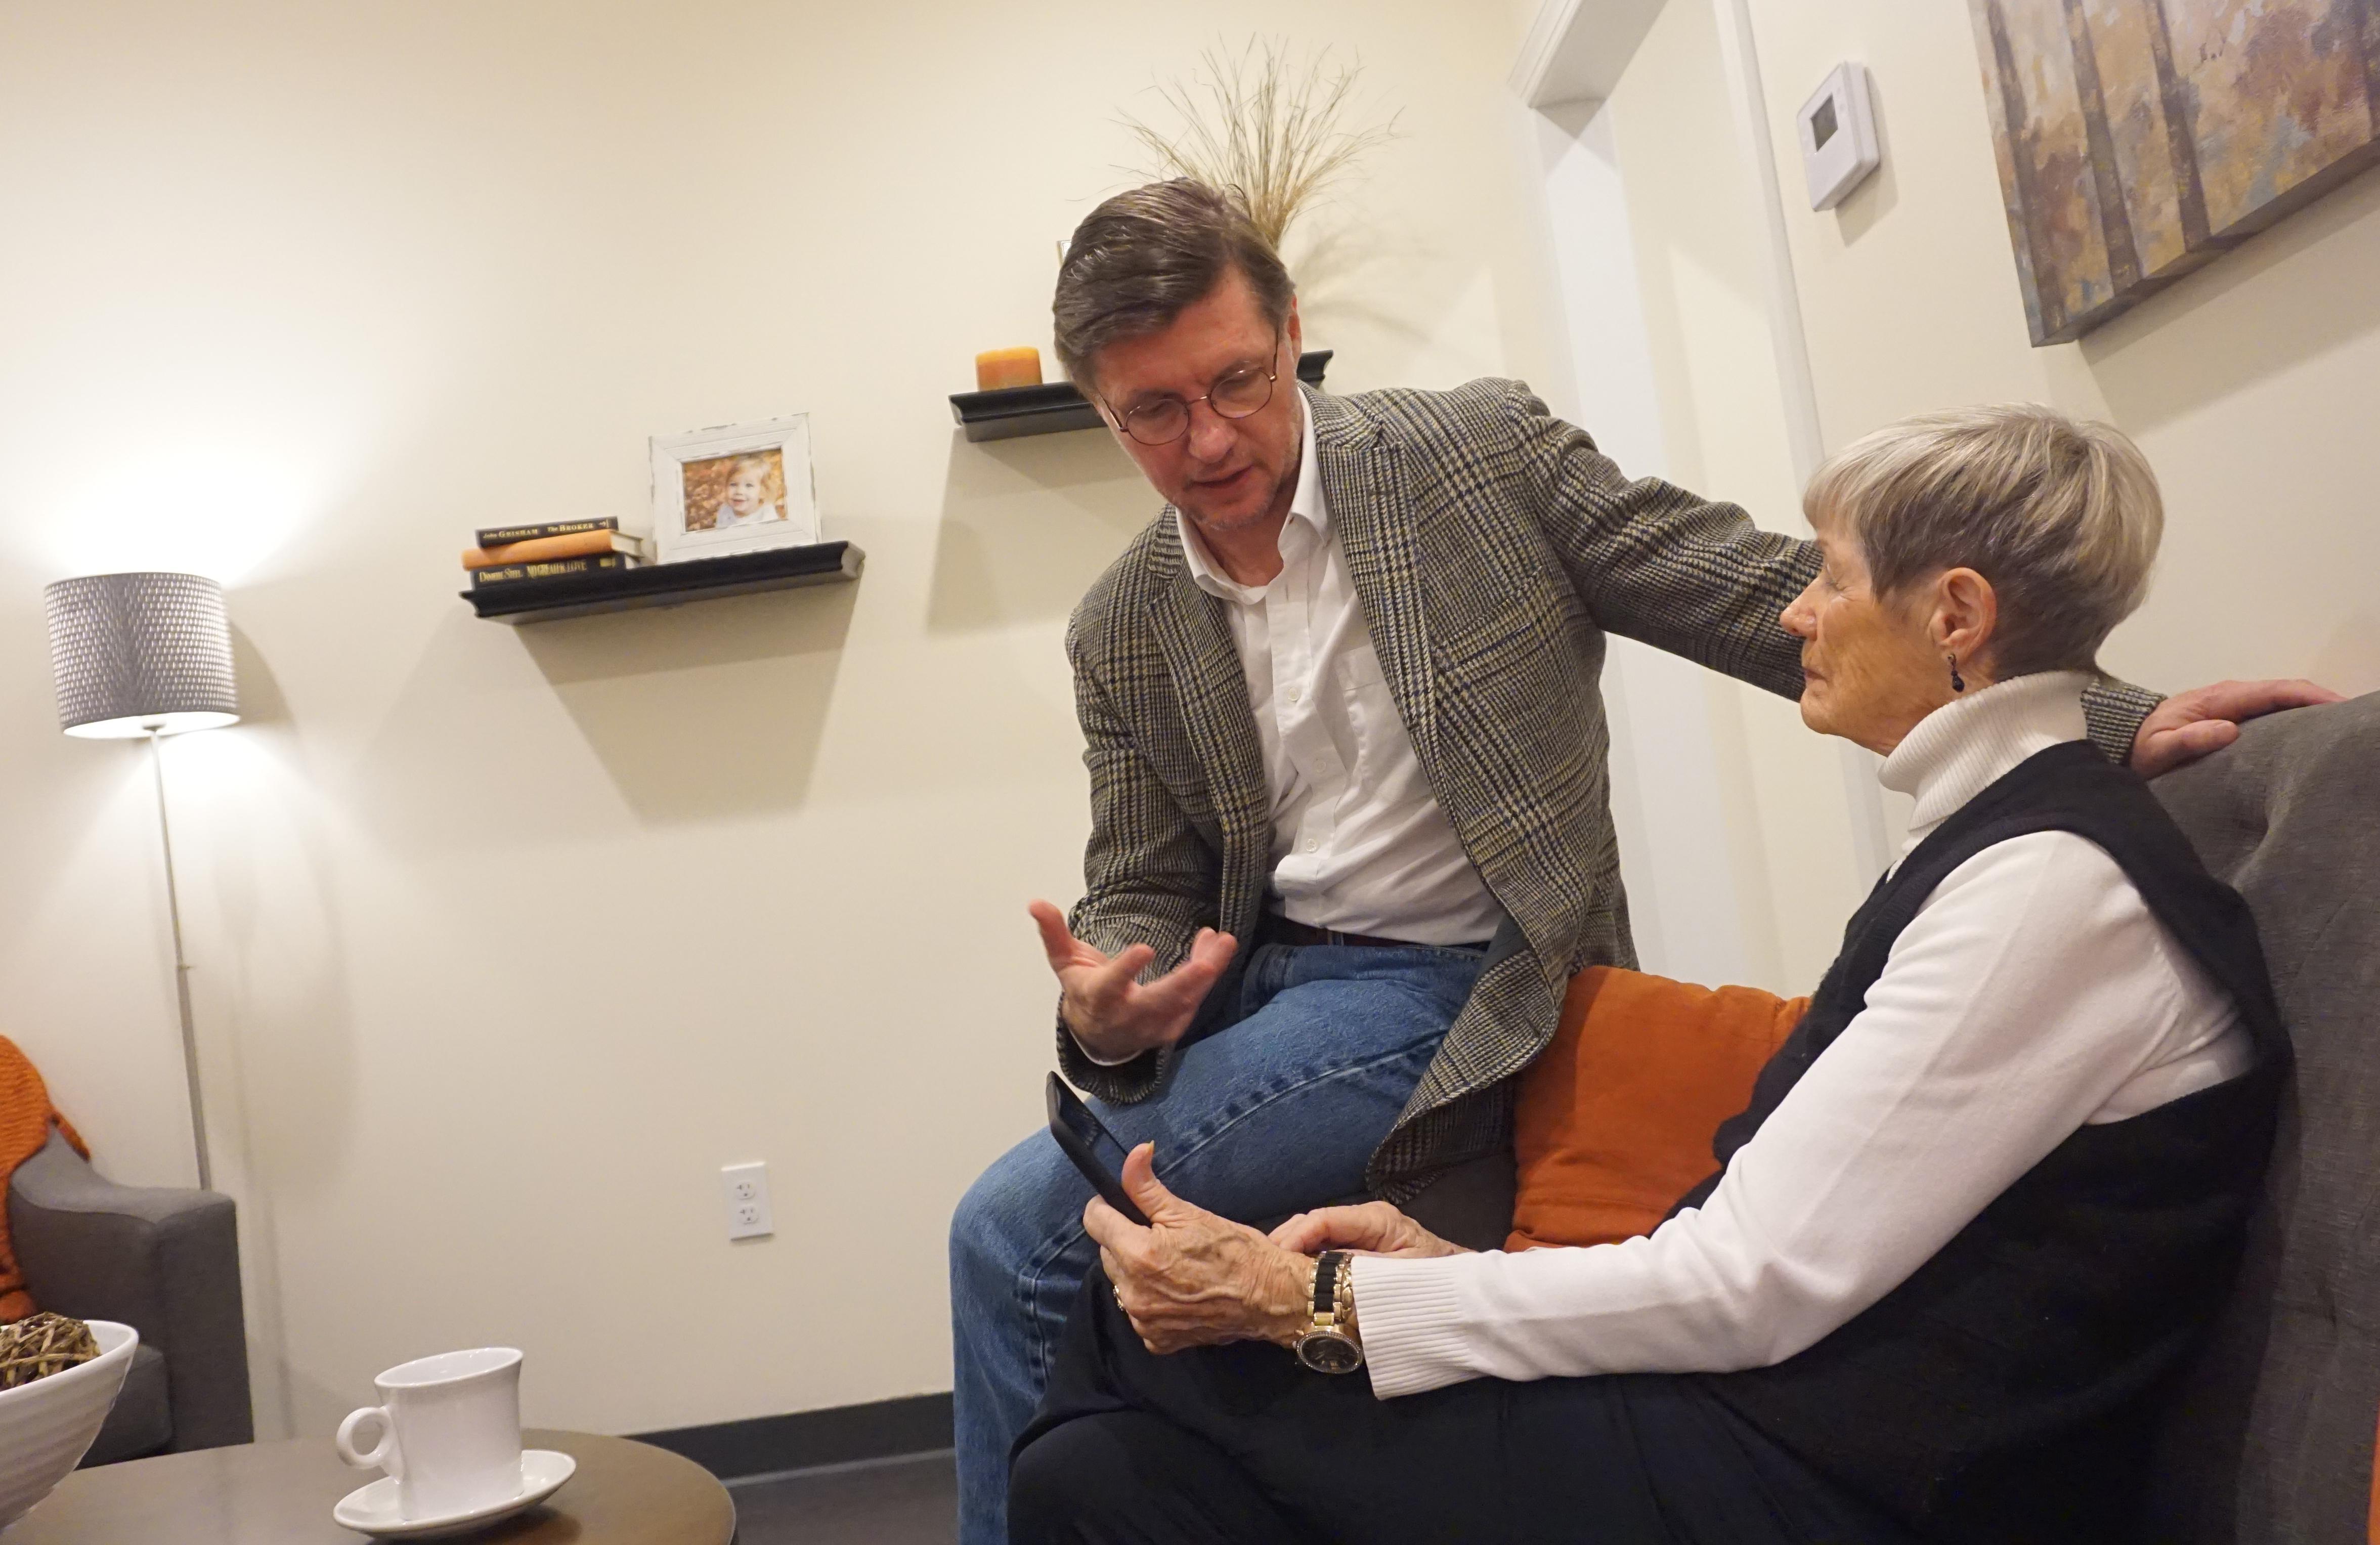 techcrunch.com - Sarah Perez - K4Connect, a startup bringing tech to senior living centers, closes its $21M Series B